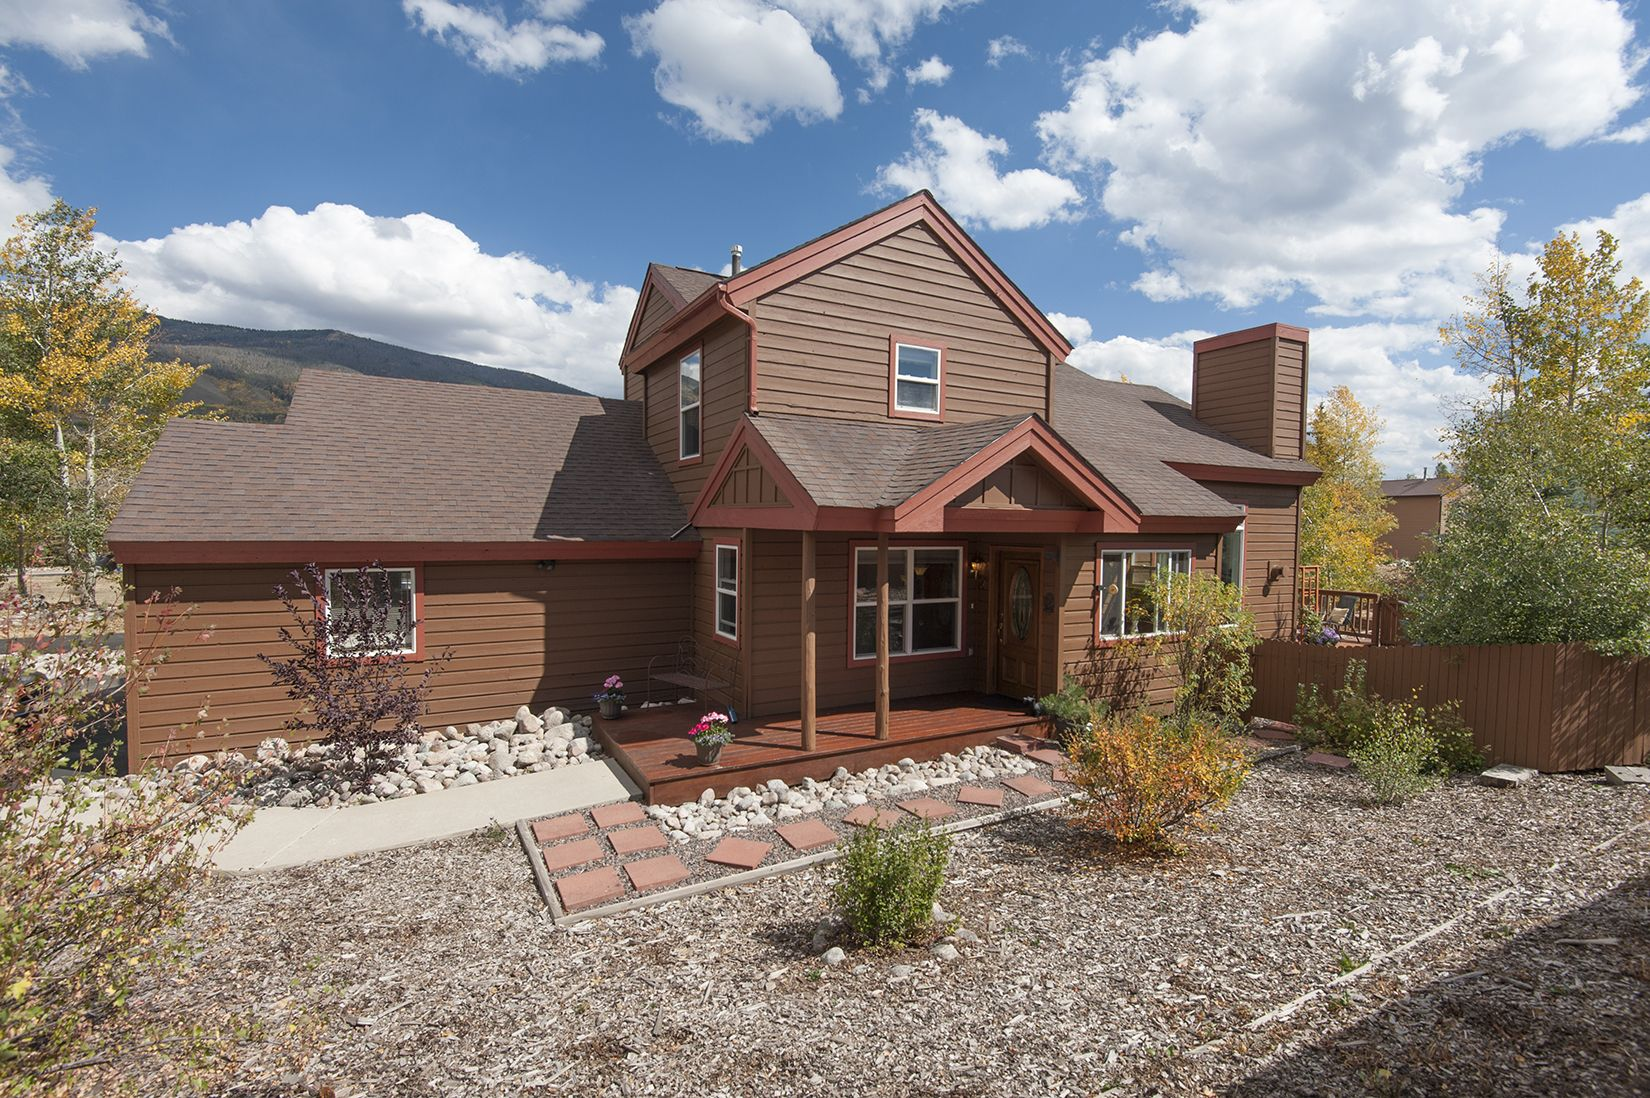 1658 N Chipmunk LANE N SILVERTHORNE, Colorado 80498